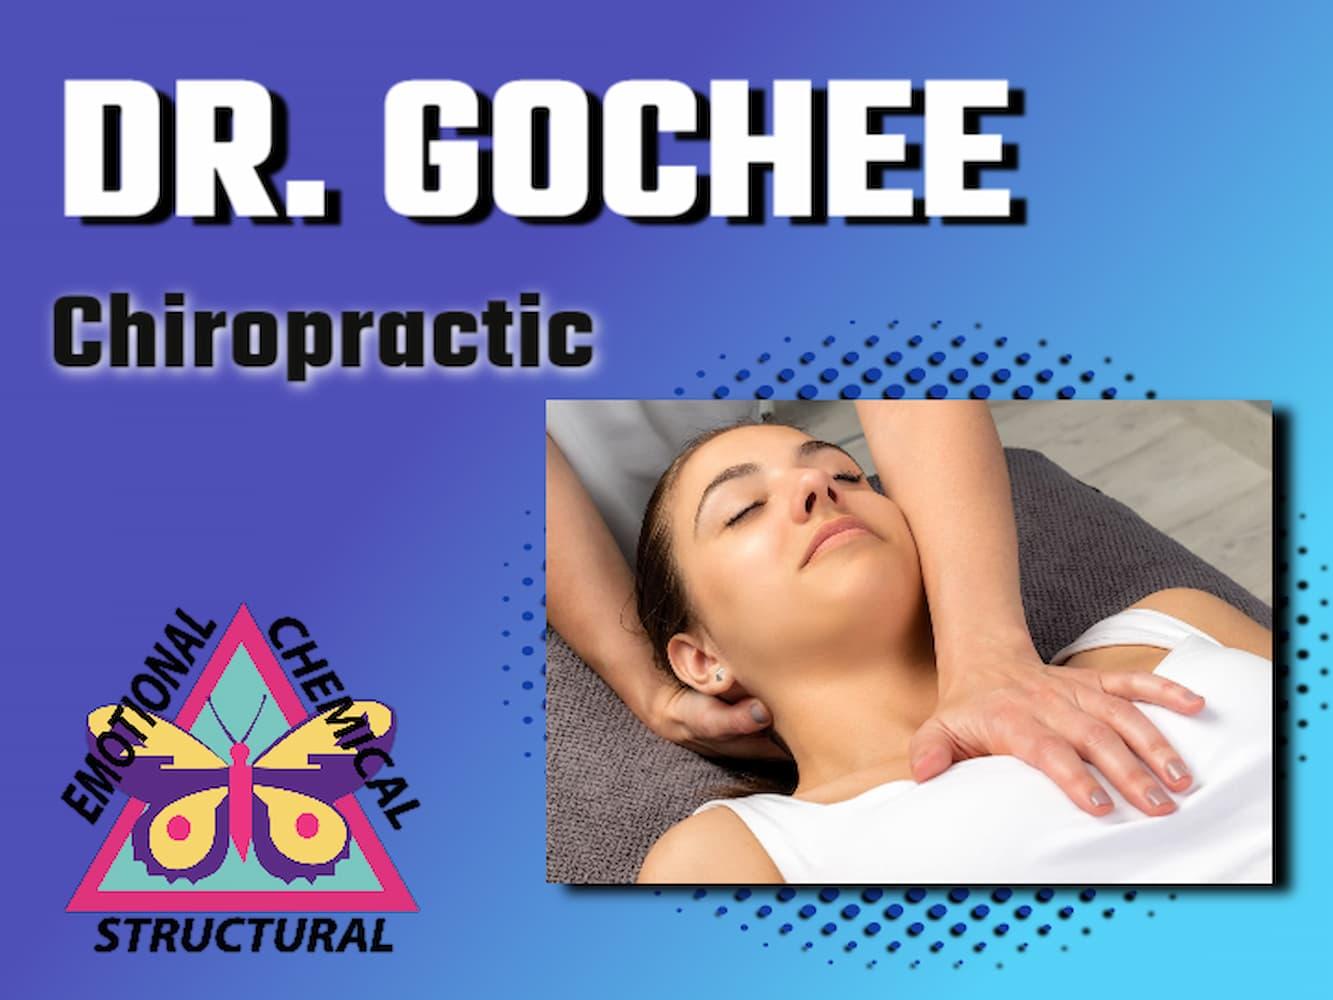 Dr. Gochee Chiropractor Dr. Gochee at Crossroads Wellness CO_Grand Junction_2530 N. 8th St. #203